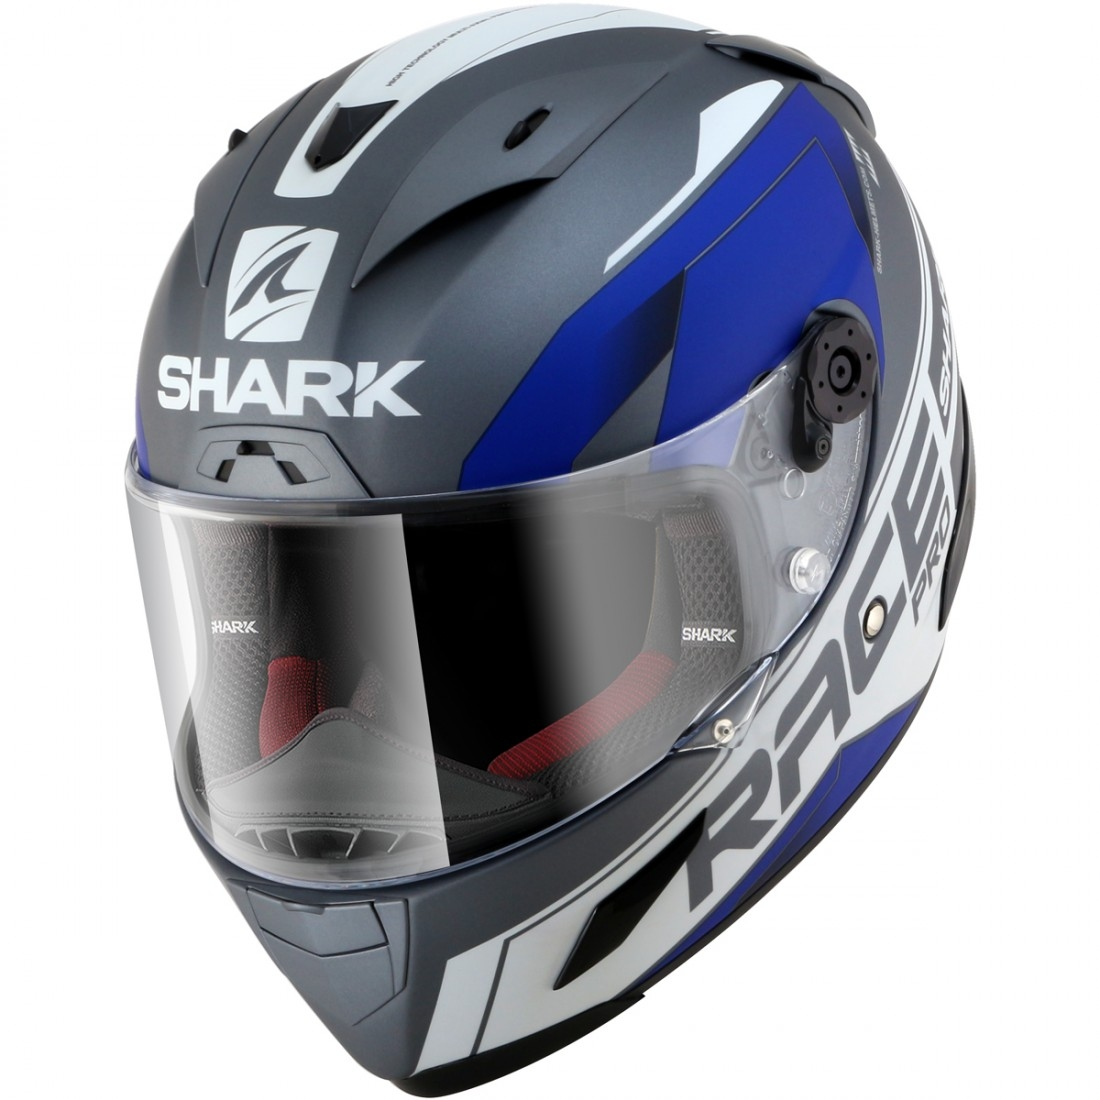 shark race r pro sauer mat anthracite white blue helmet motocard. Black Bedroom Furniture Sets. Home Design Ideas